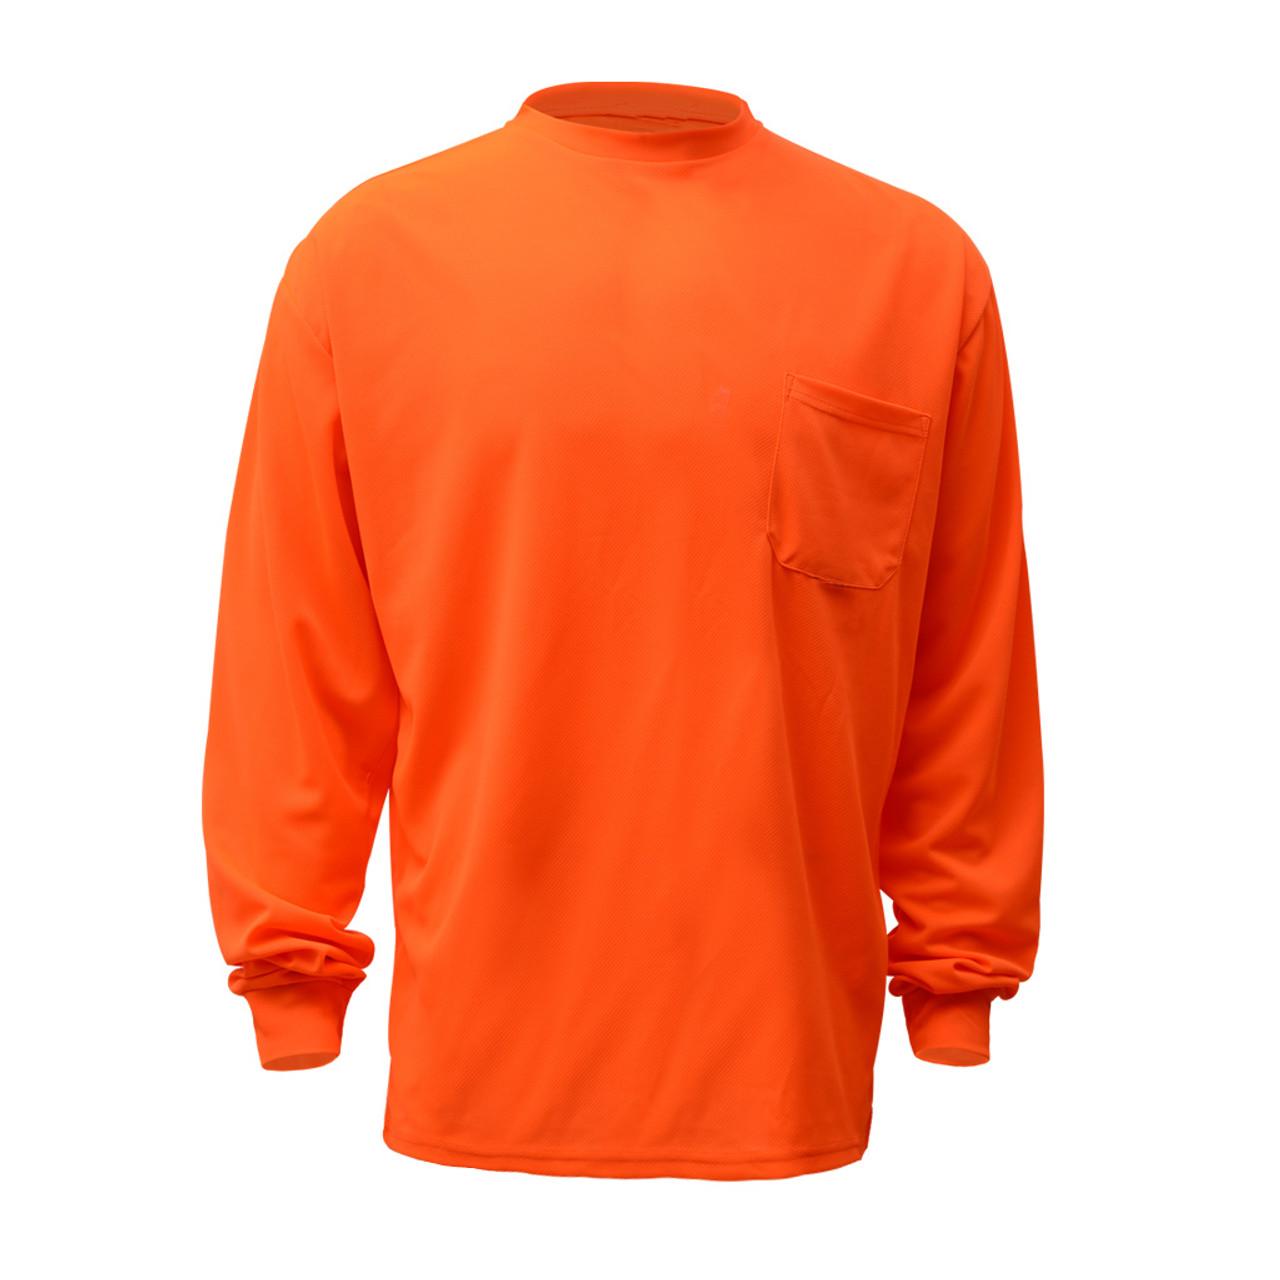 c346a95213e3 GSS Non-ANSI Hi Vis Orange Long Sleeve T-Shirt 5504 Front